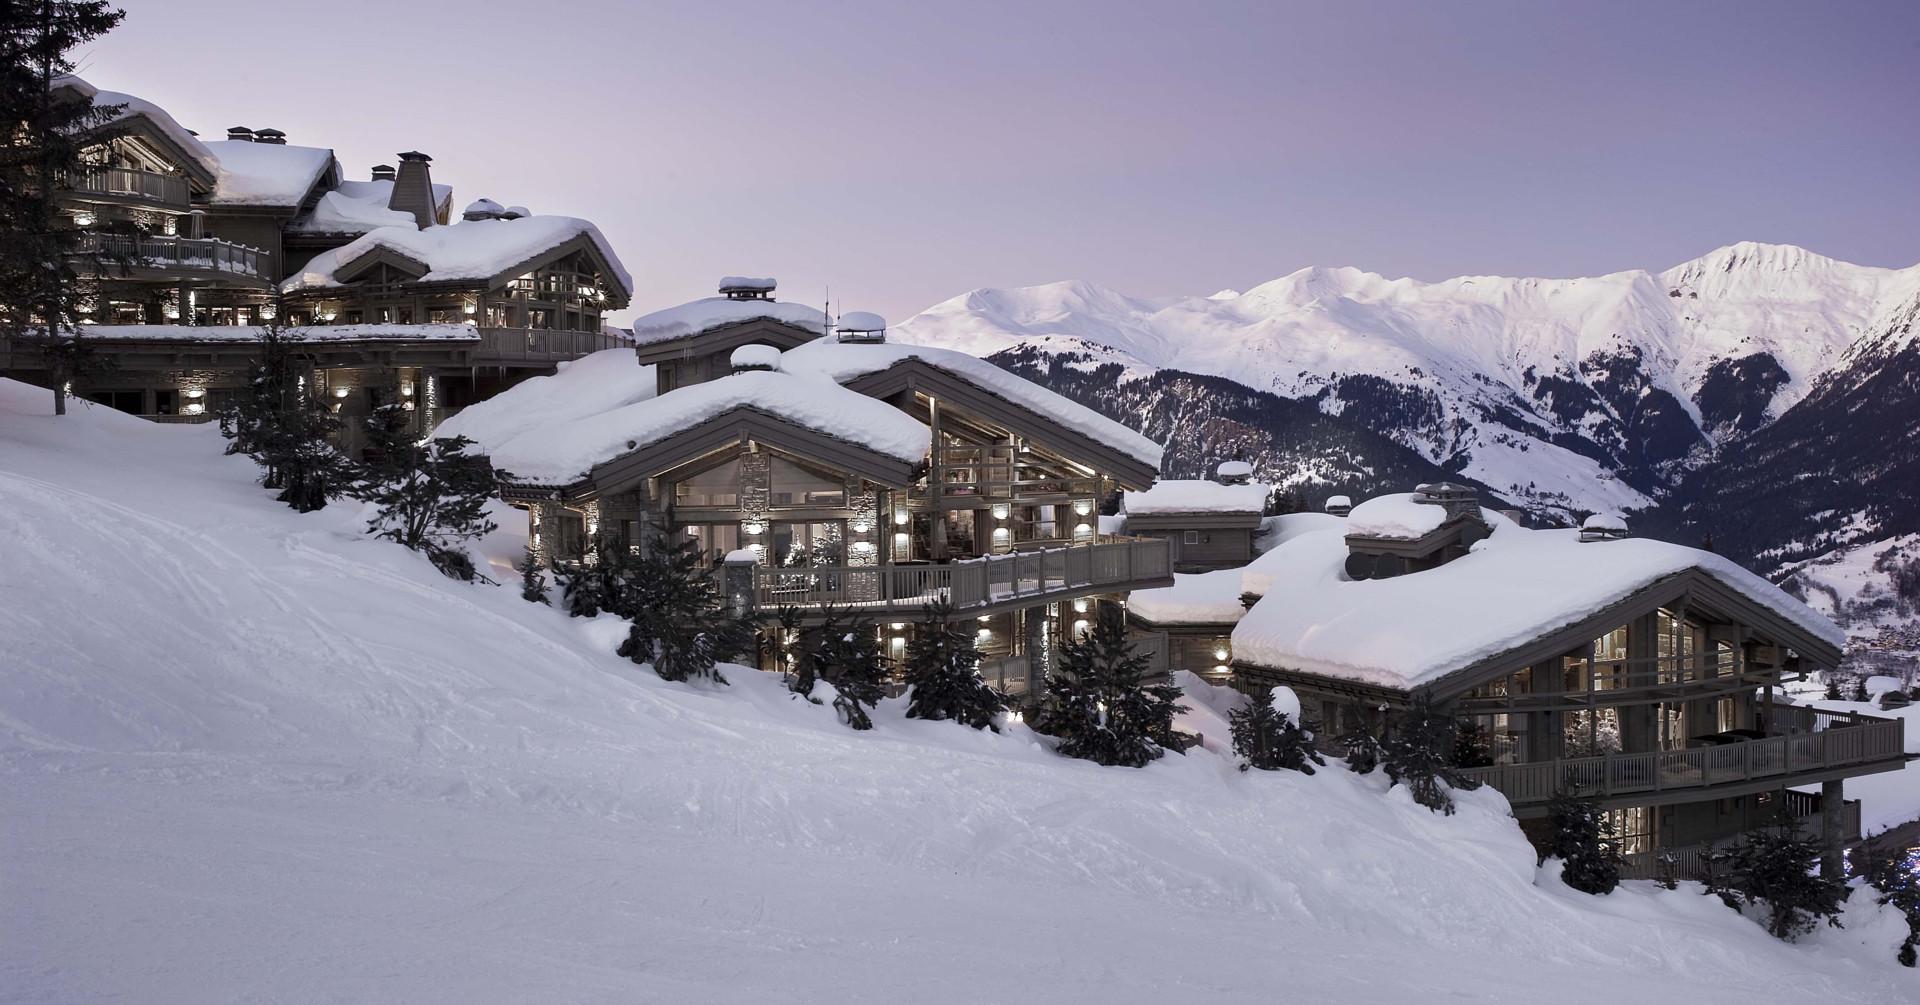 Le K2, Courchevel - Luxury Hotel France - Original Travel